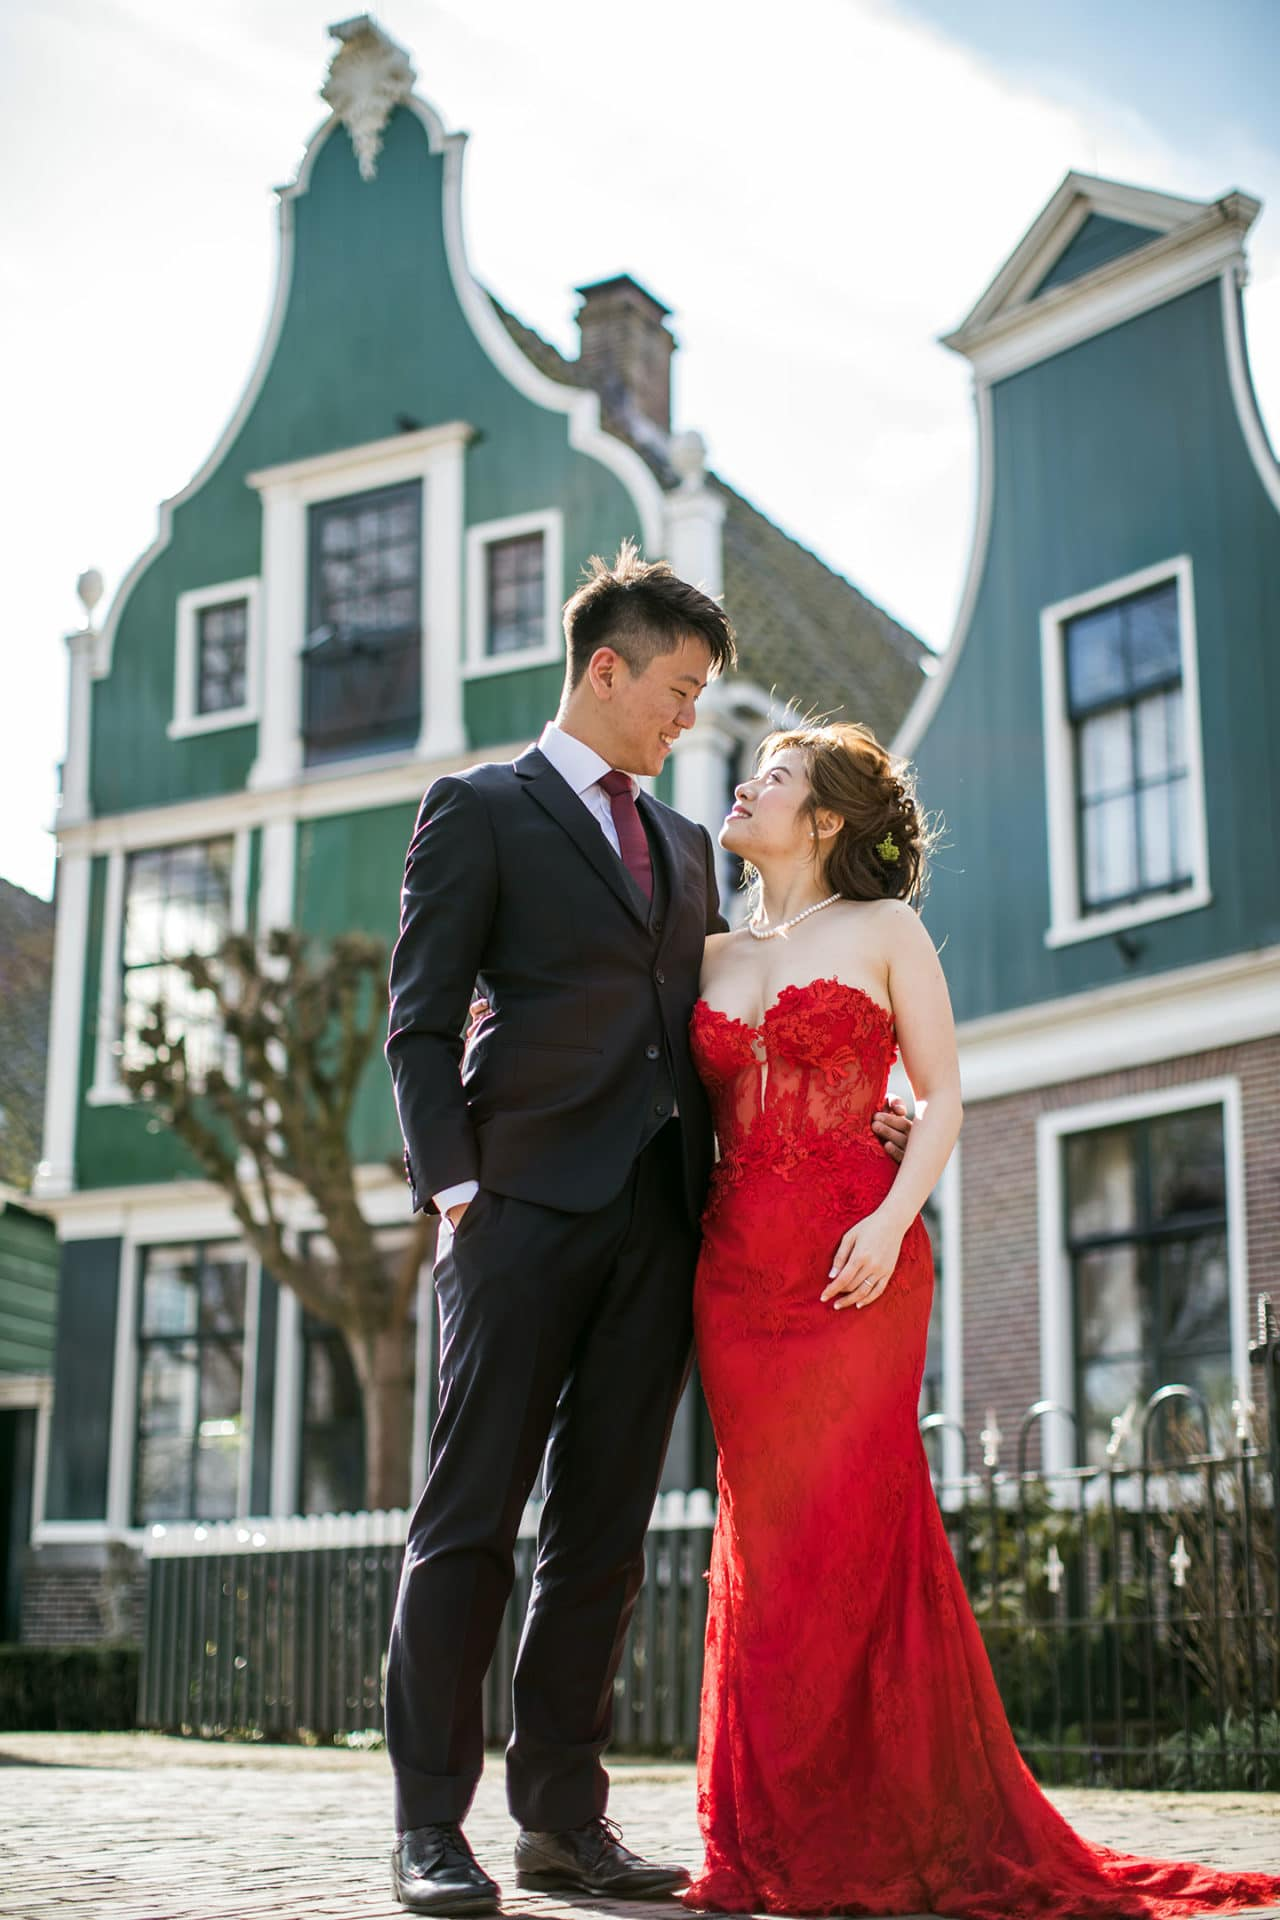 Amsterdam & Zaanse Schans prewedding photographer